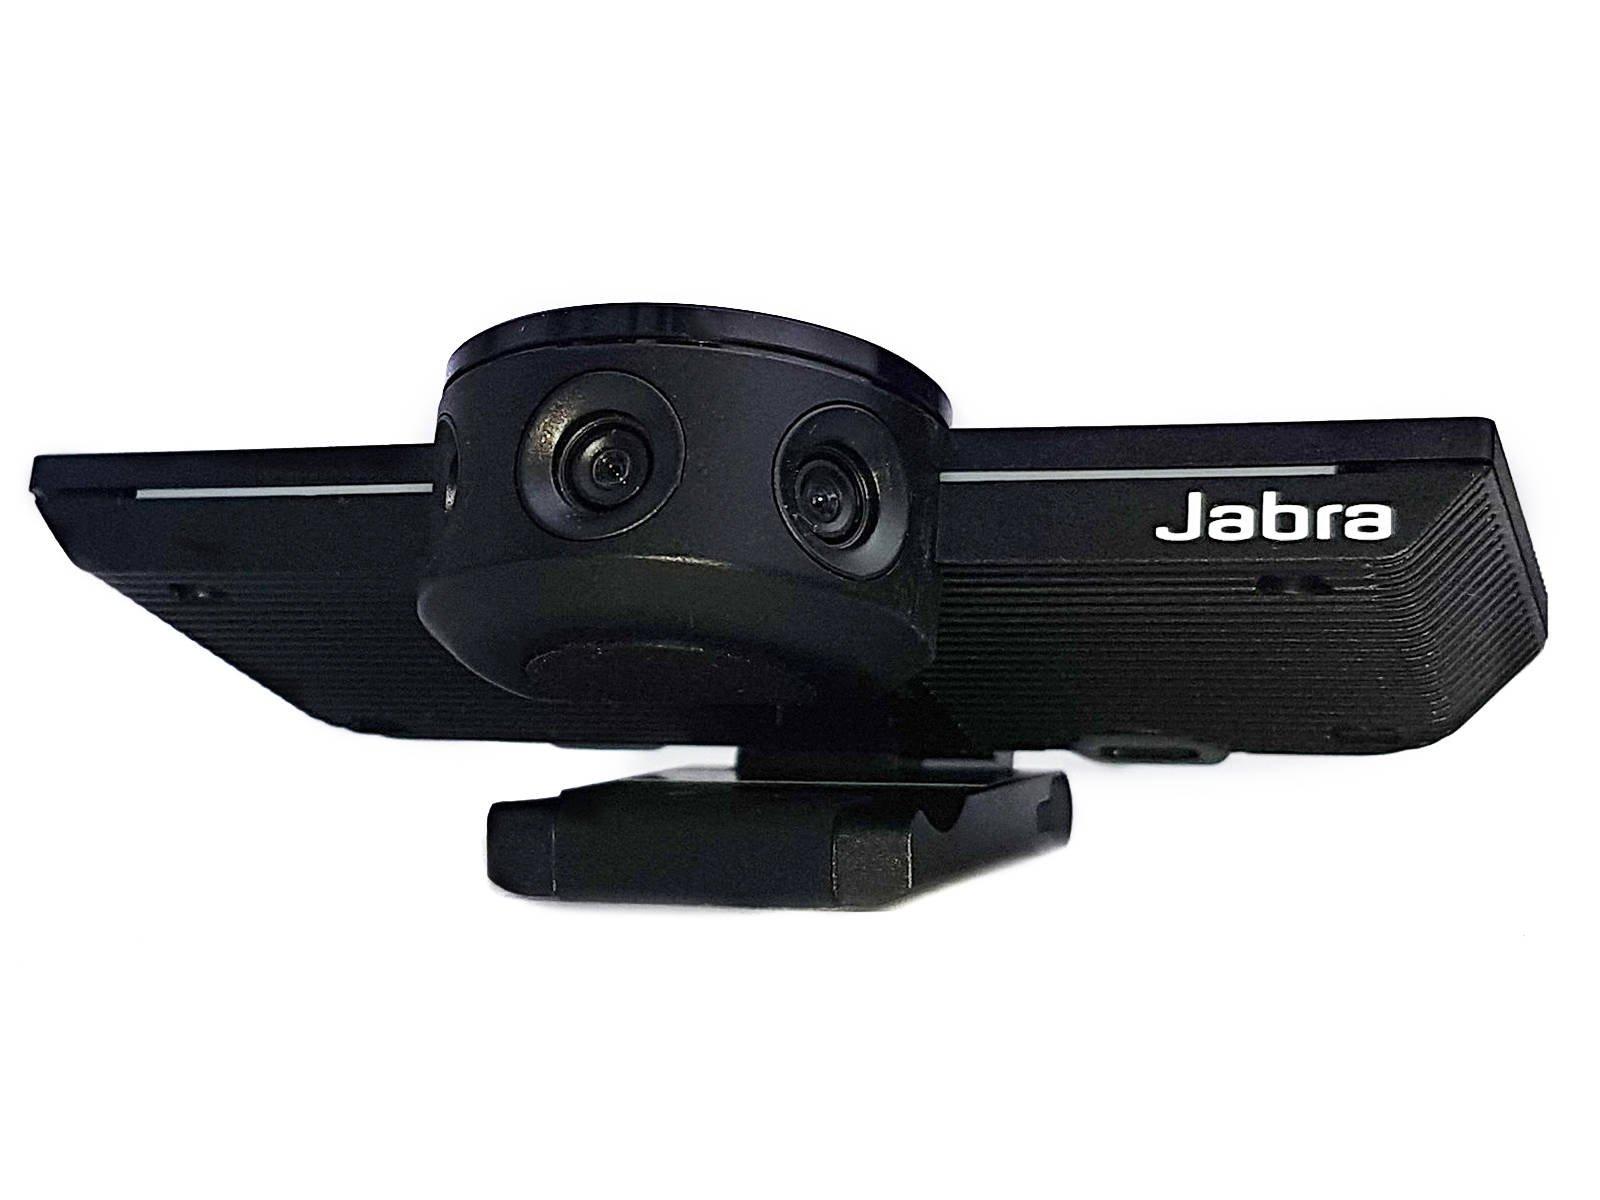 JABRA PanaCast 8100-119 Videoconference Camera 4K/180